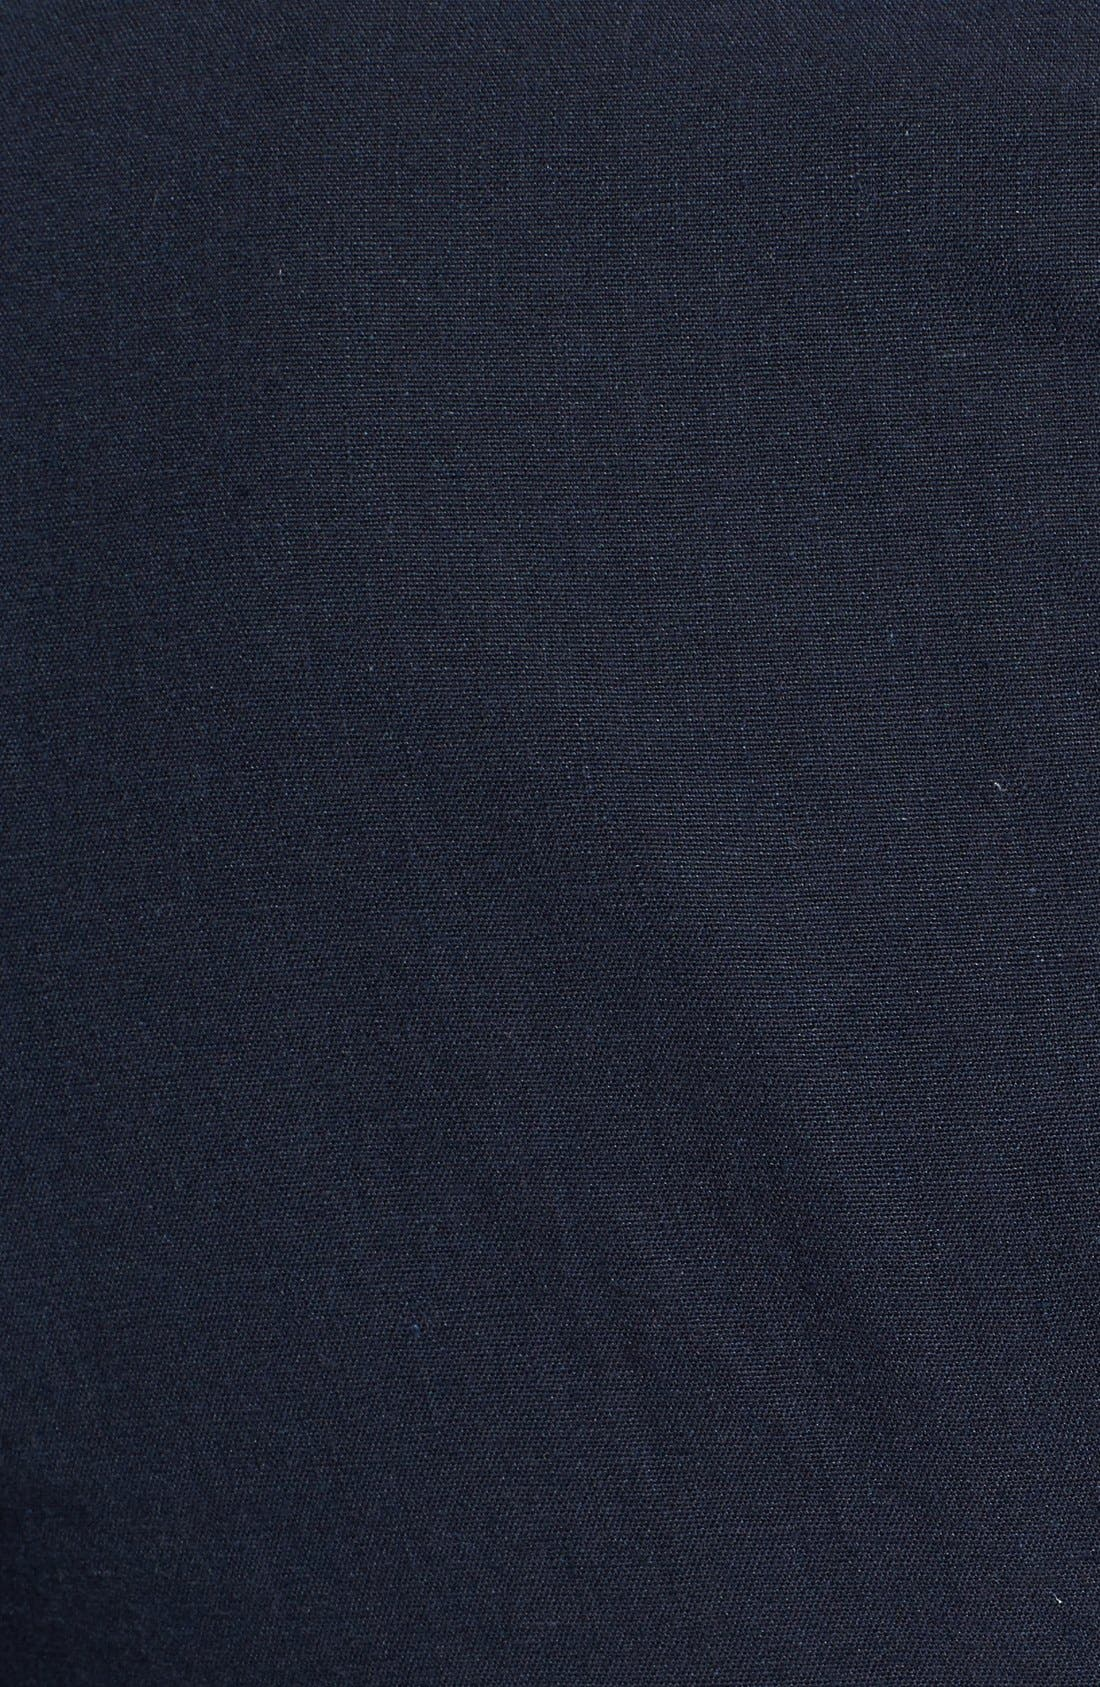 Alternate Image 3  - Billy Reid 'Lexington' Cotton & Linen Sportcoat